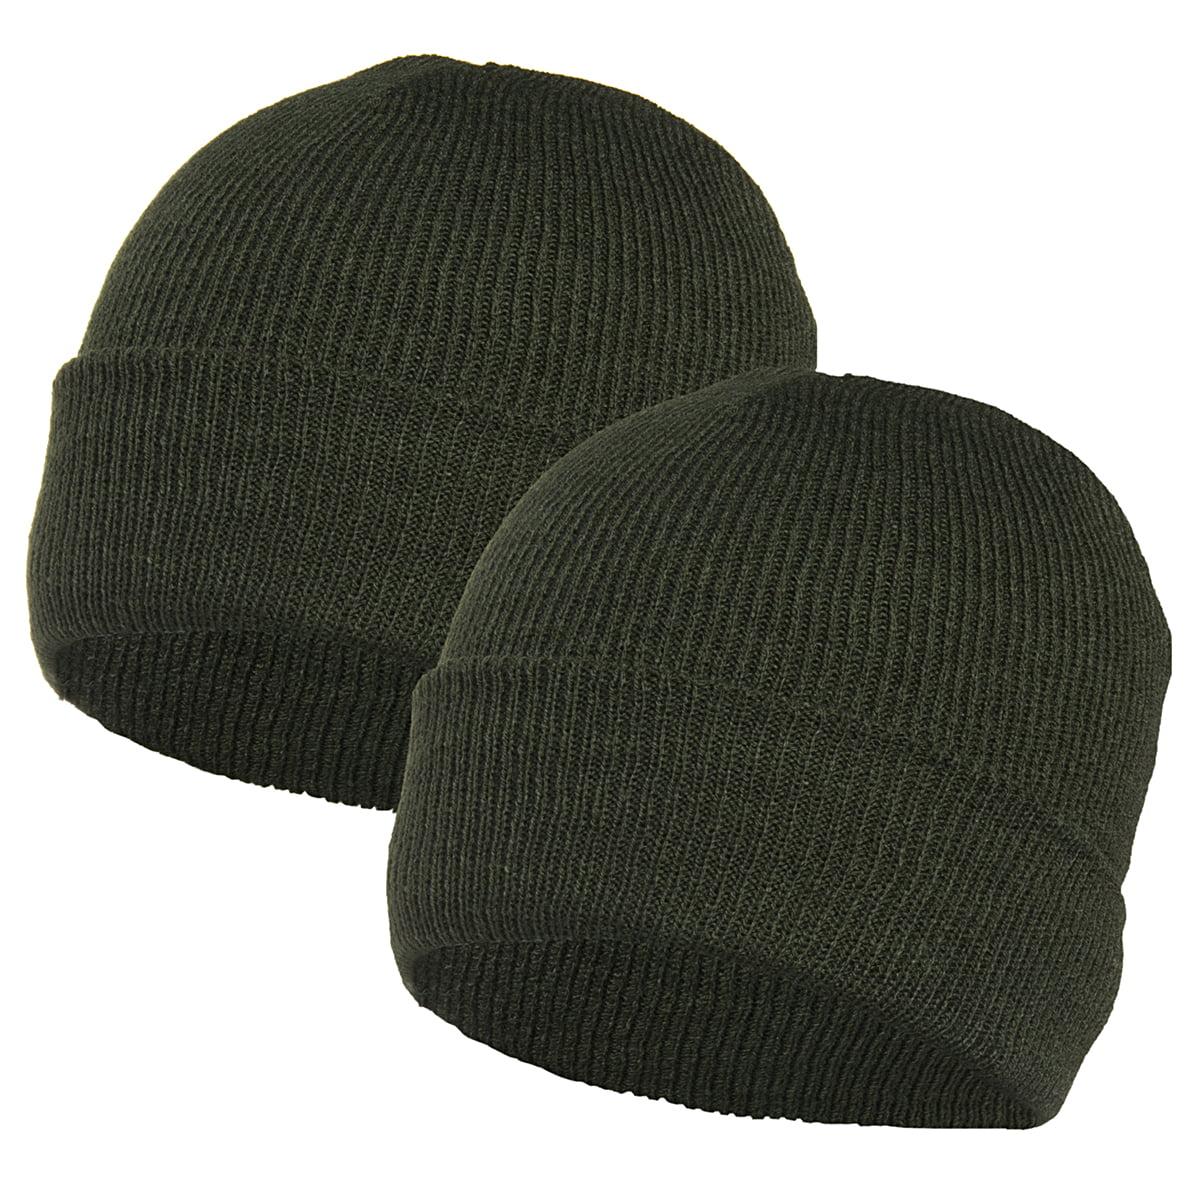 2b4e64113 2 pack Igloo Winter Ski Hats Acrylic Knit Beanie Caps Men Women Unisex  Black Gray Green